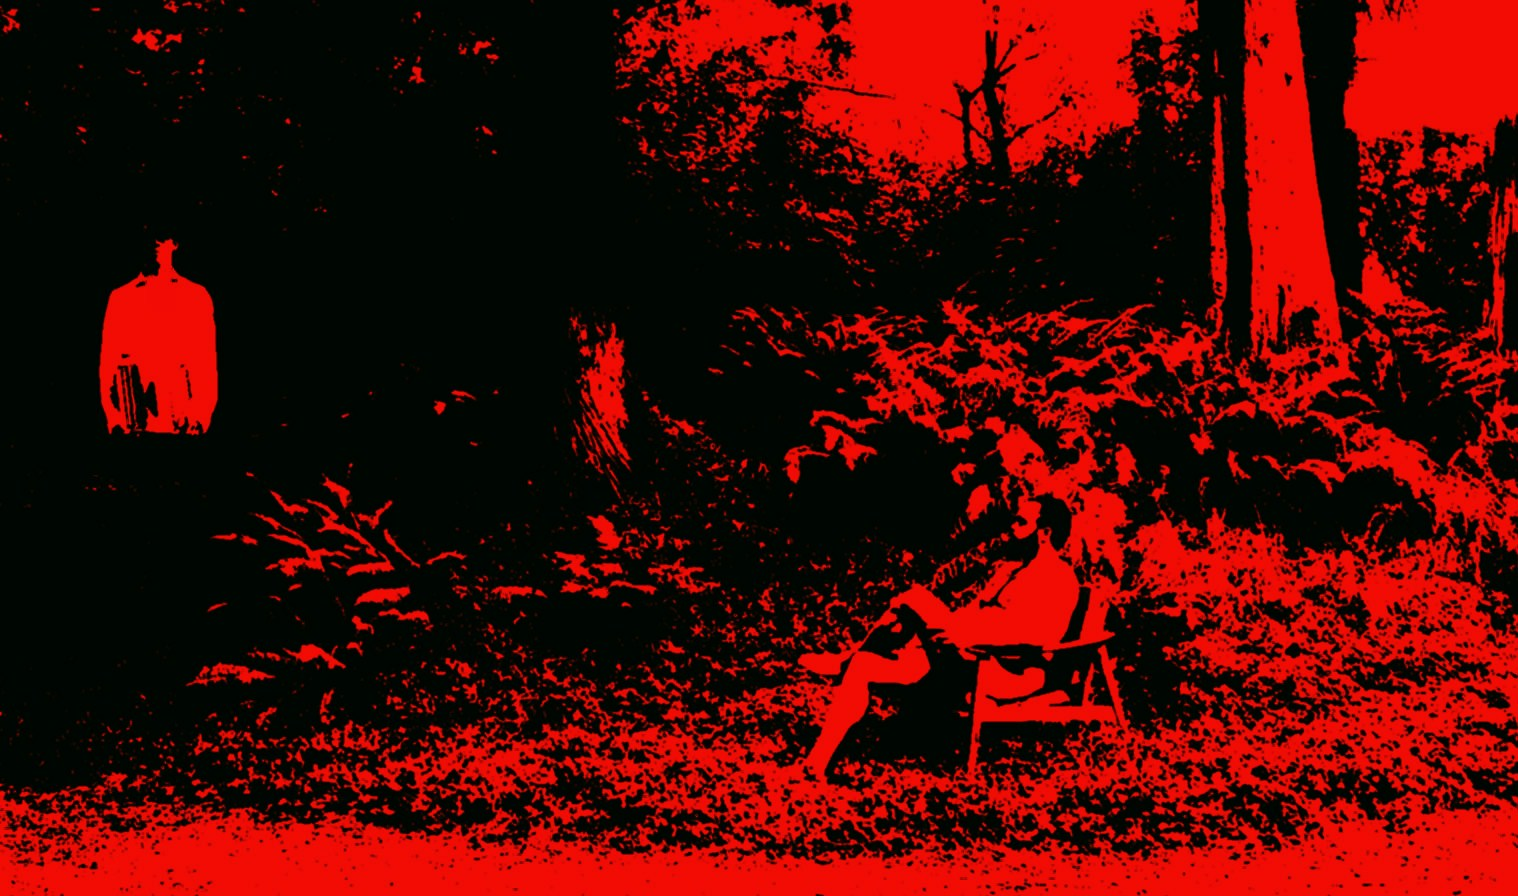 red grunp